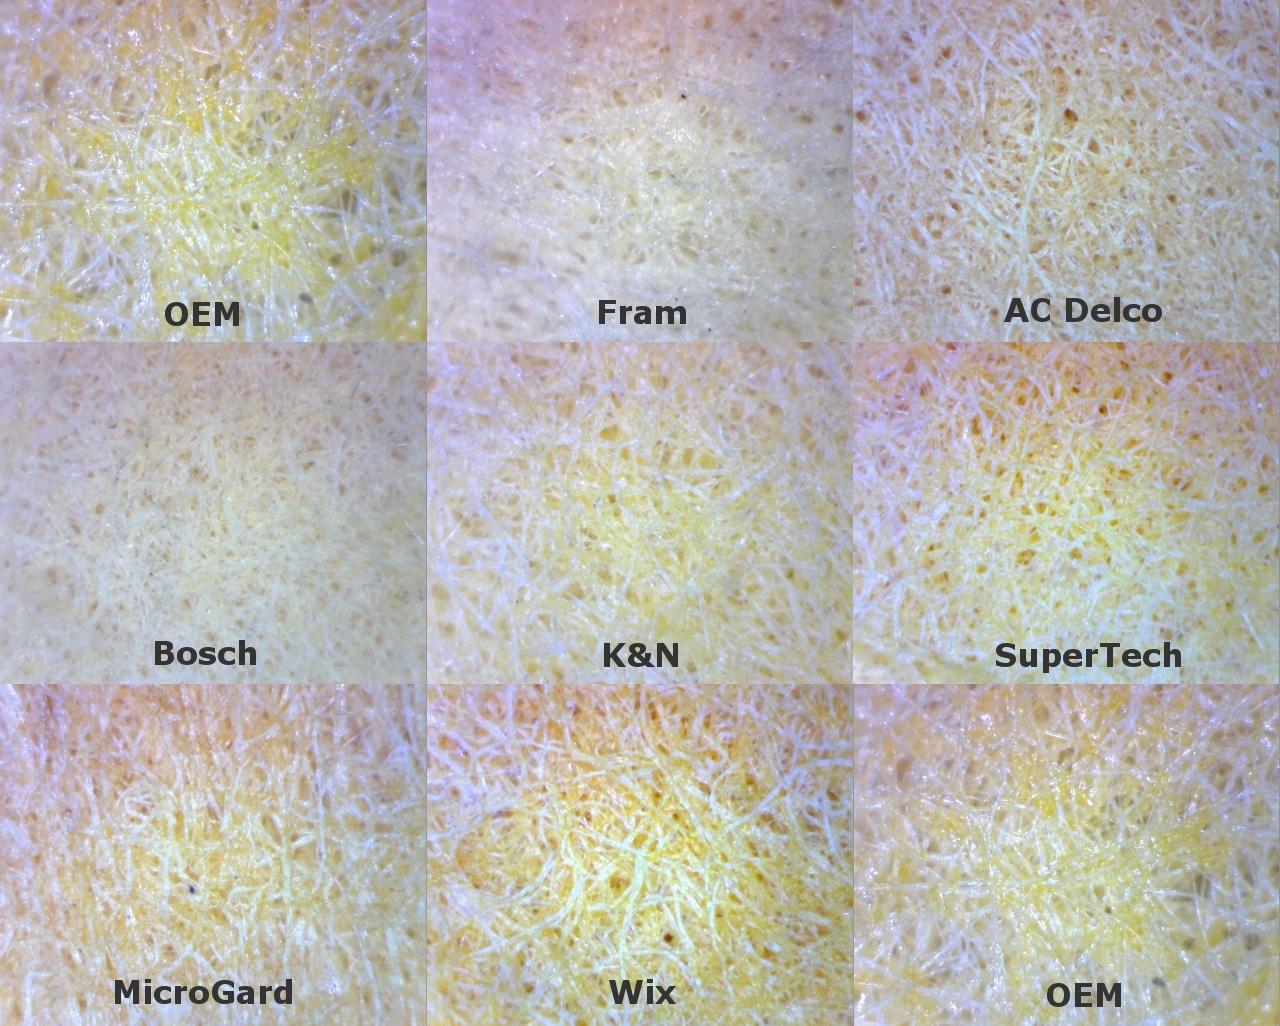 Olathe toyot tacoma oil filter comparison tacoma oem filter vs filter medium at 40x magnification filter medium at 150x magnification nvjuhfo Gallery